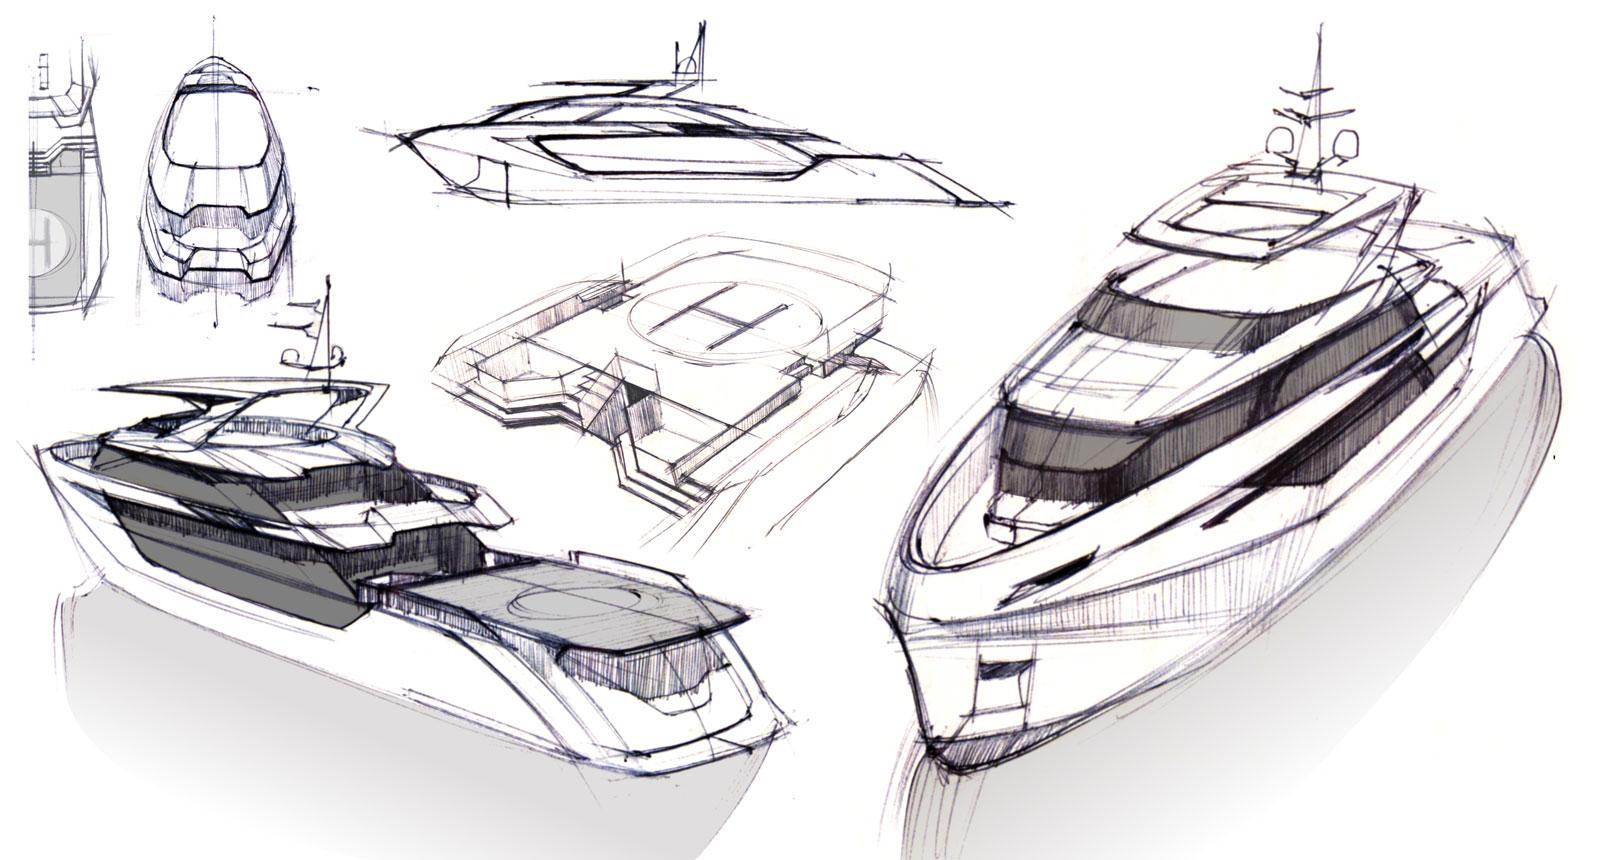 Art Line Yacht Design : Greywolf meter explorer yacht by politecnico di milano